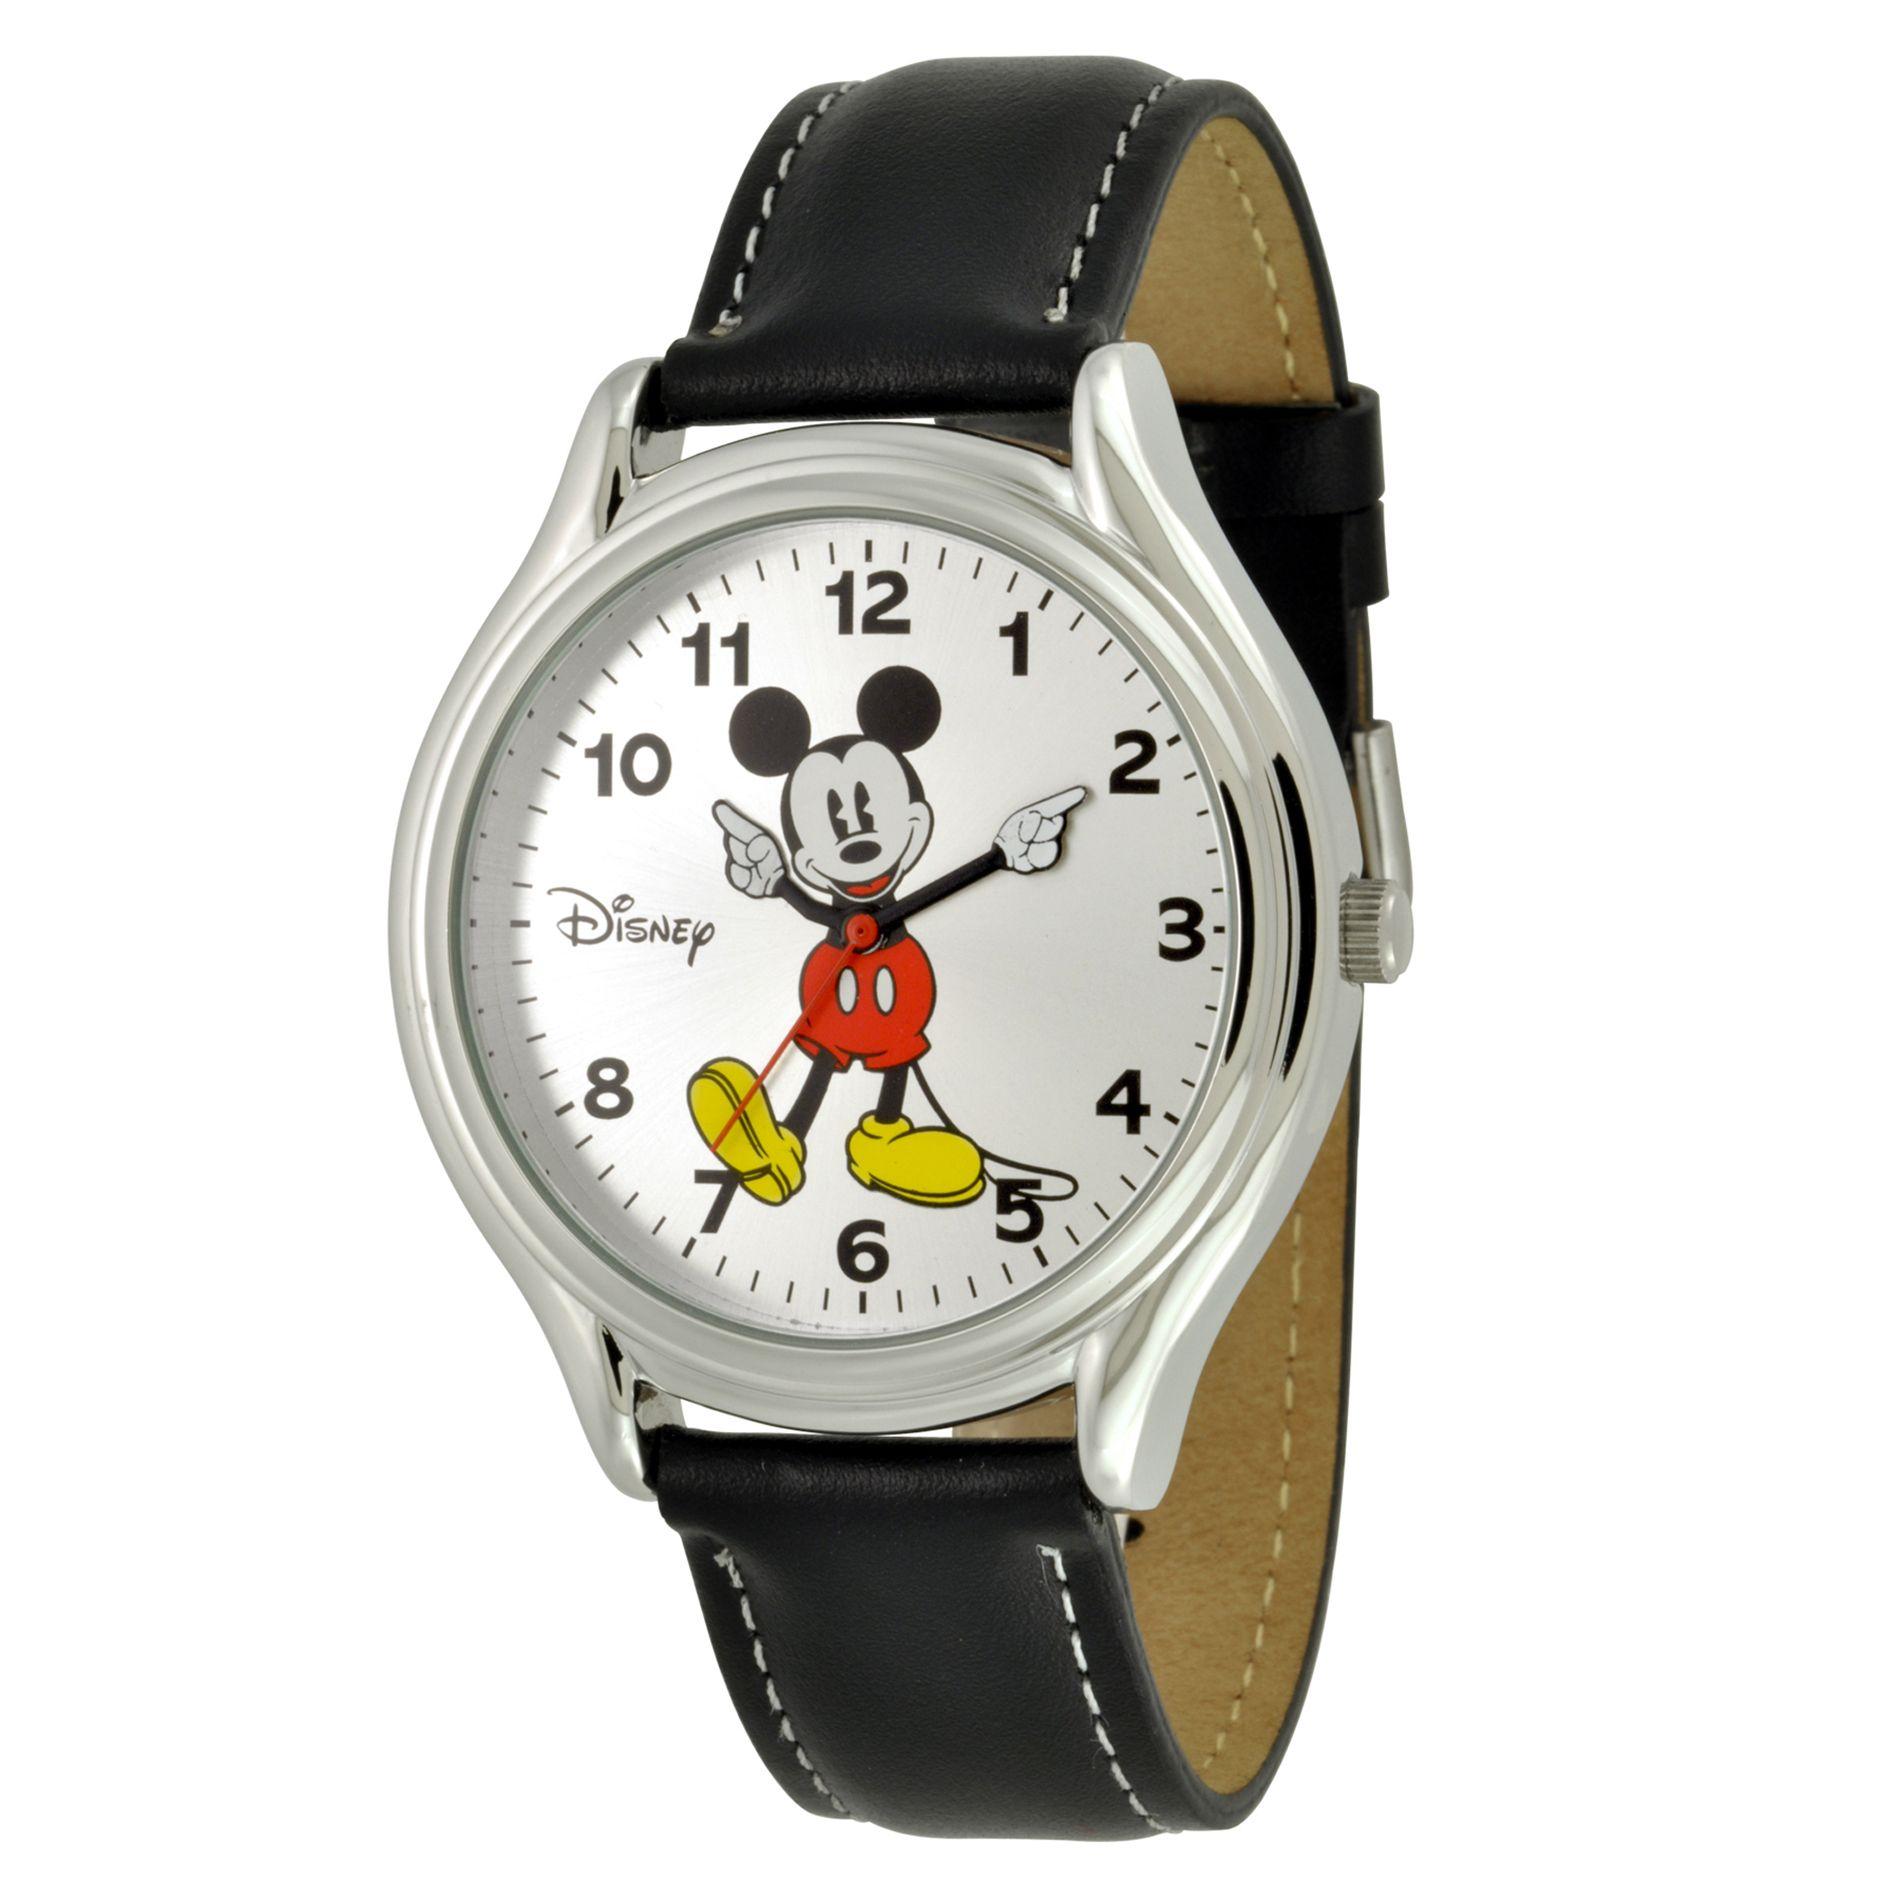 Disney Mickey Mouse Watch Withround Silver-tone Case White